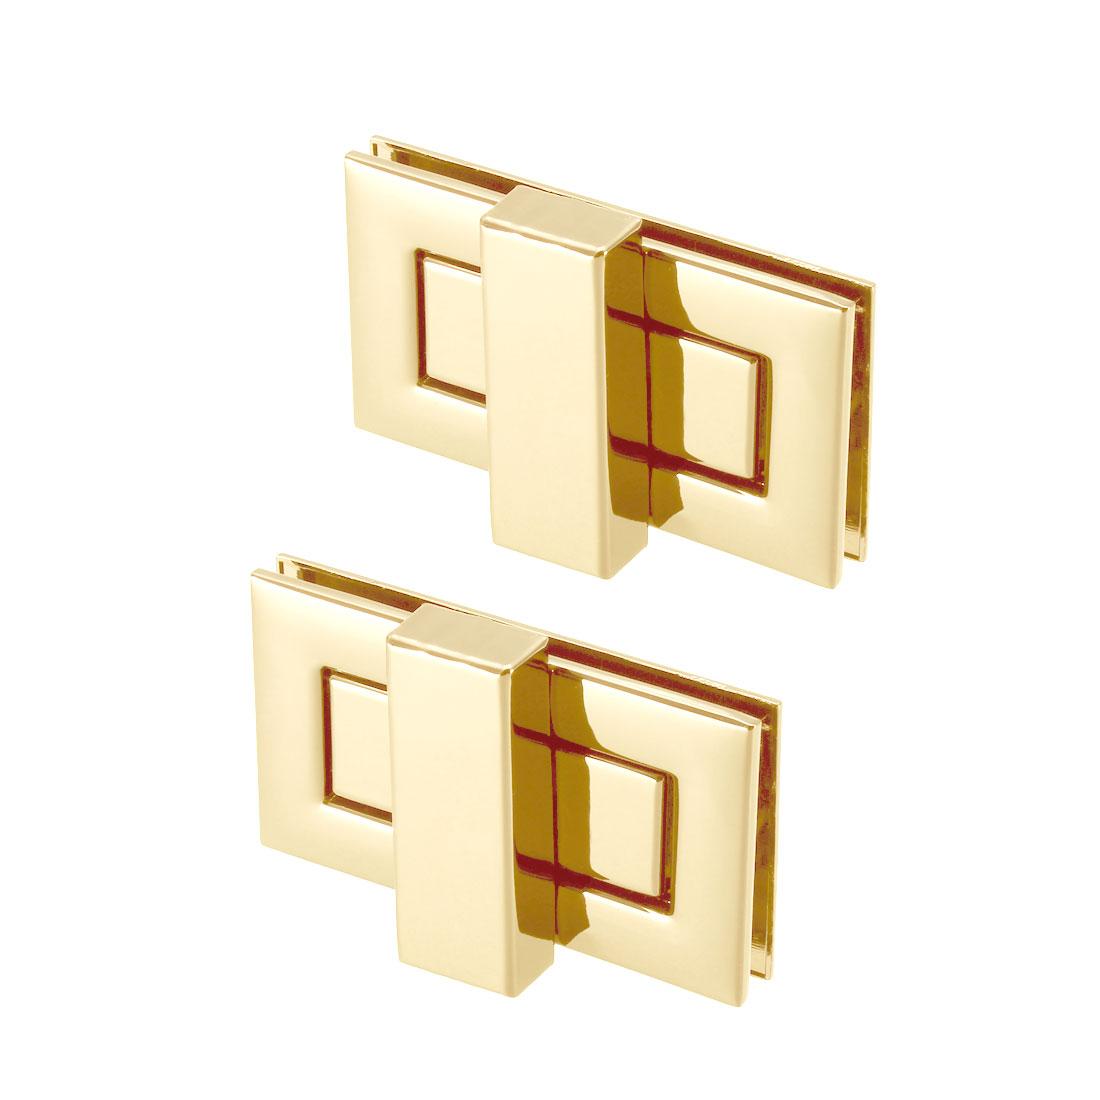 2 Sets Rectangular Purses Twist Lock 52mm x 29mm Clutches Closures - Light Gold